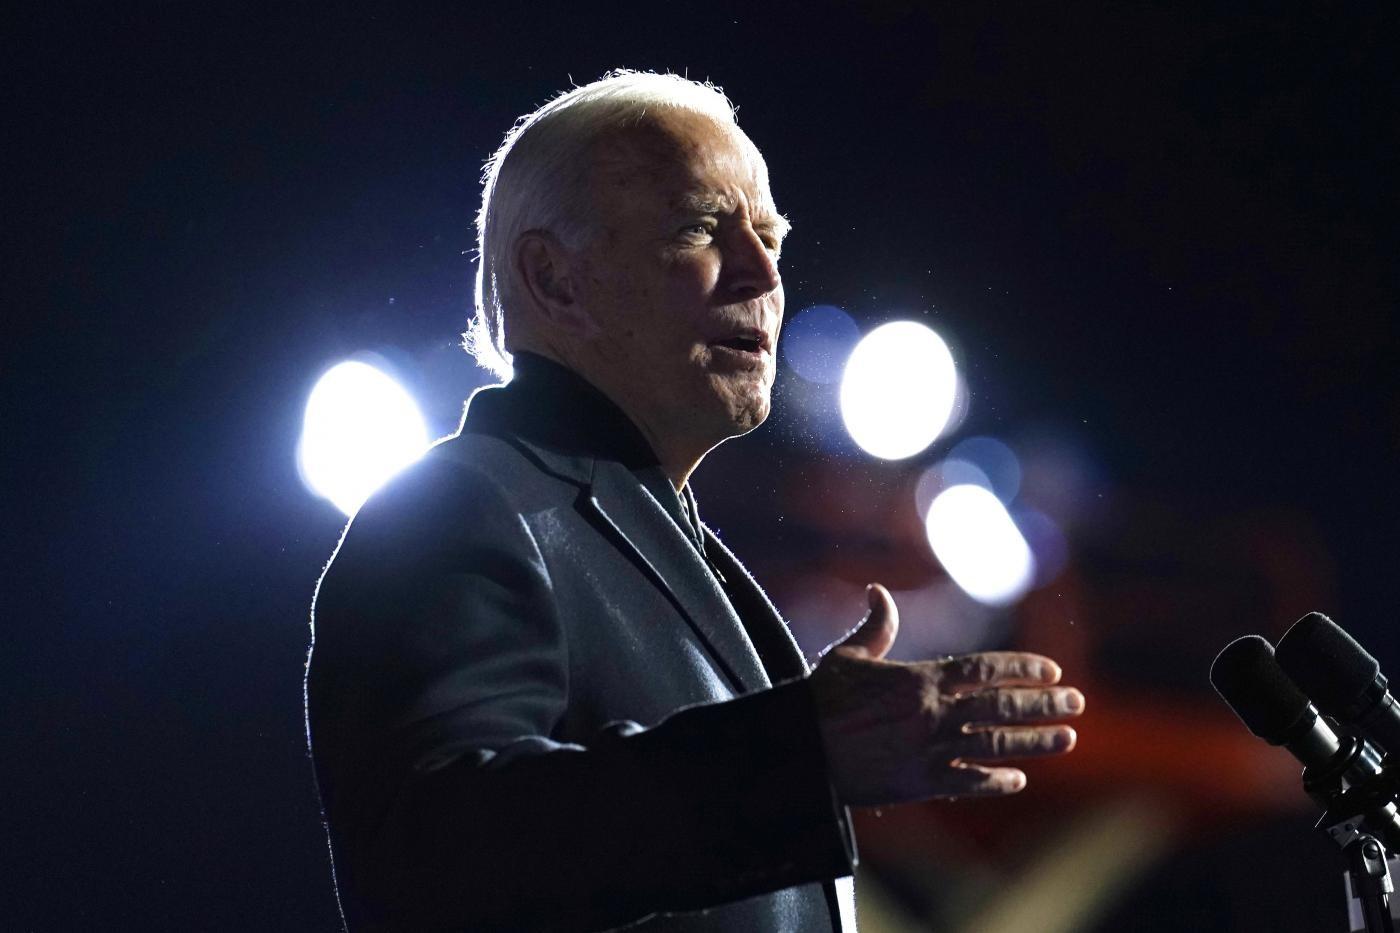 USA 2020, Biden: 'Middle class Joe', veterano politica a 3° tentativo per Casa Bianca